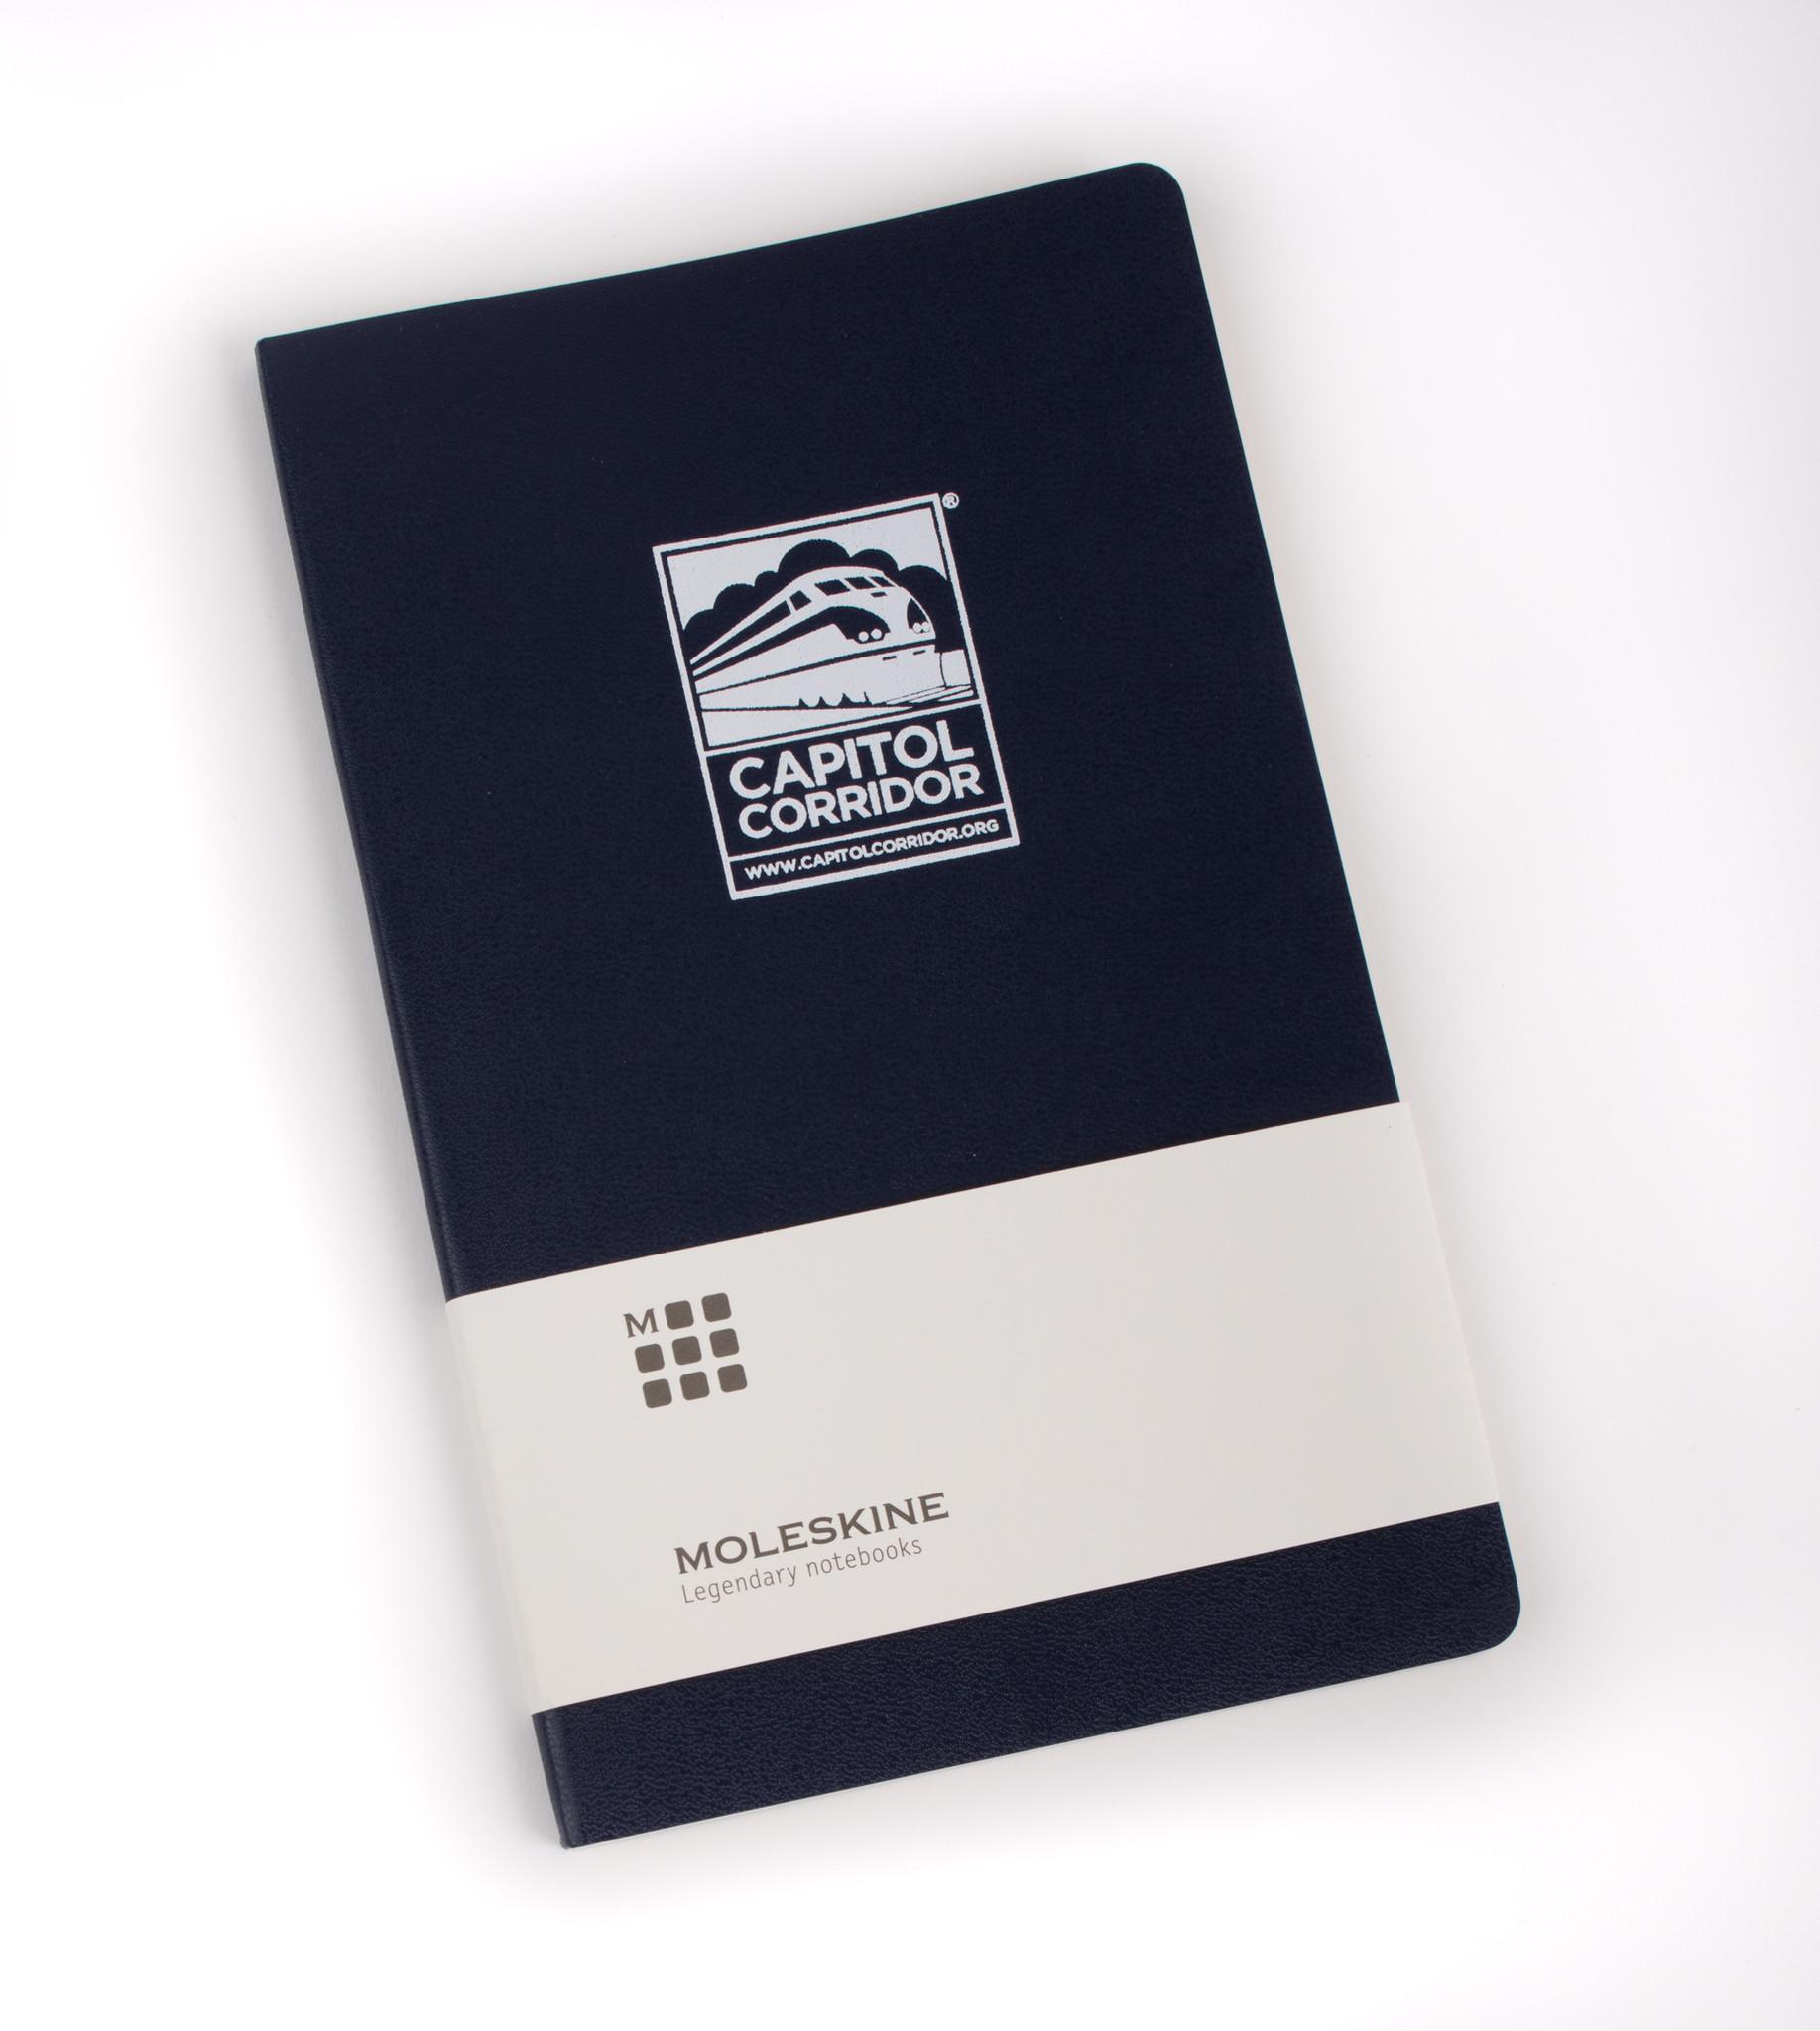 Proforma Albrecht & Co. Capitol Corridor Moleskine Notebook